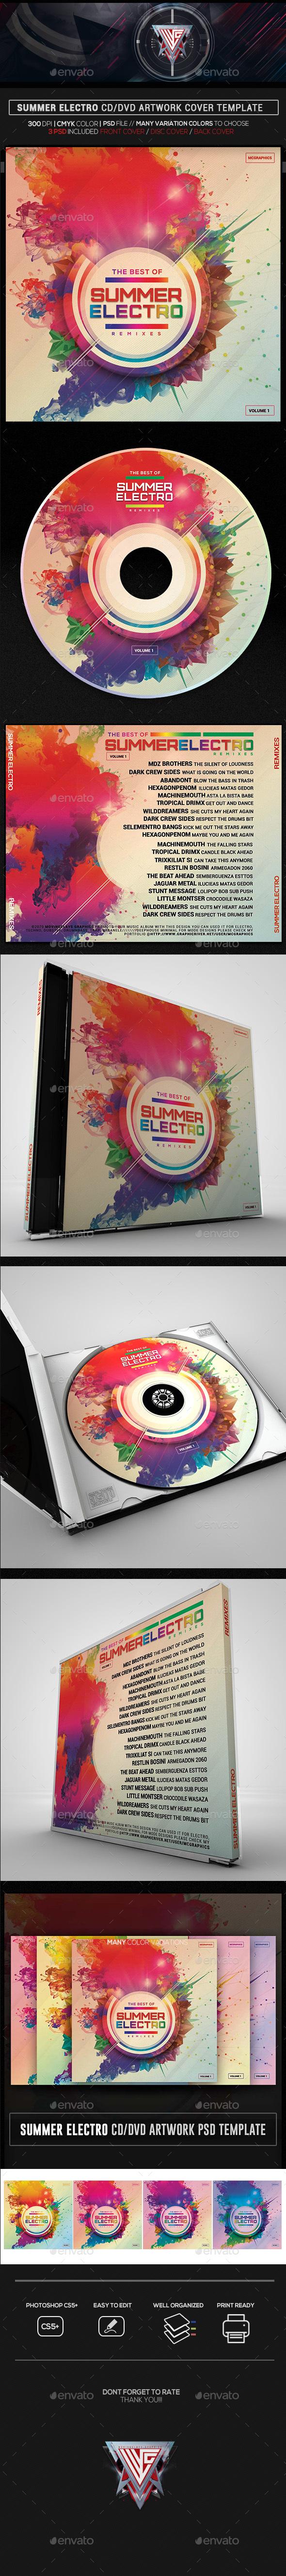 Summer Electro CD/DVD Template - CD & DVD Artwork Print Templates